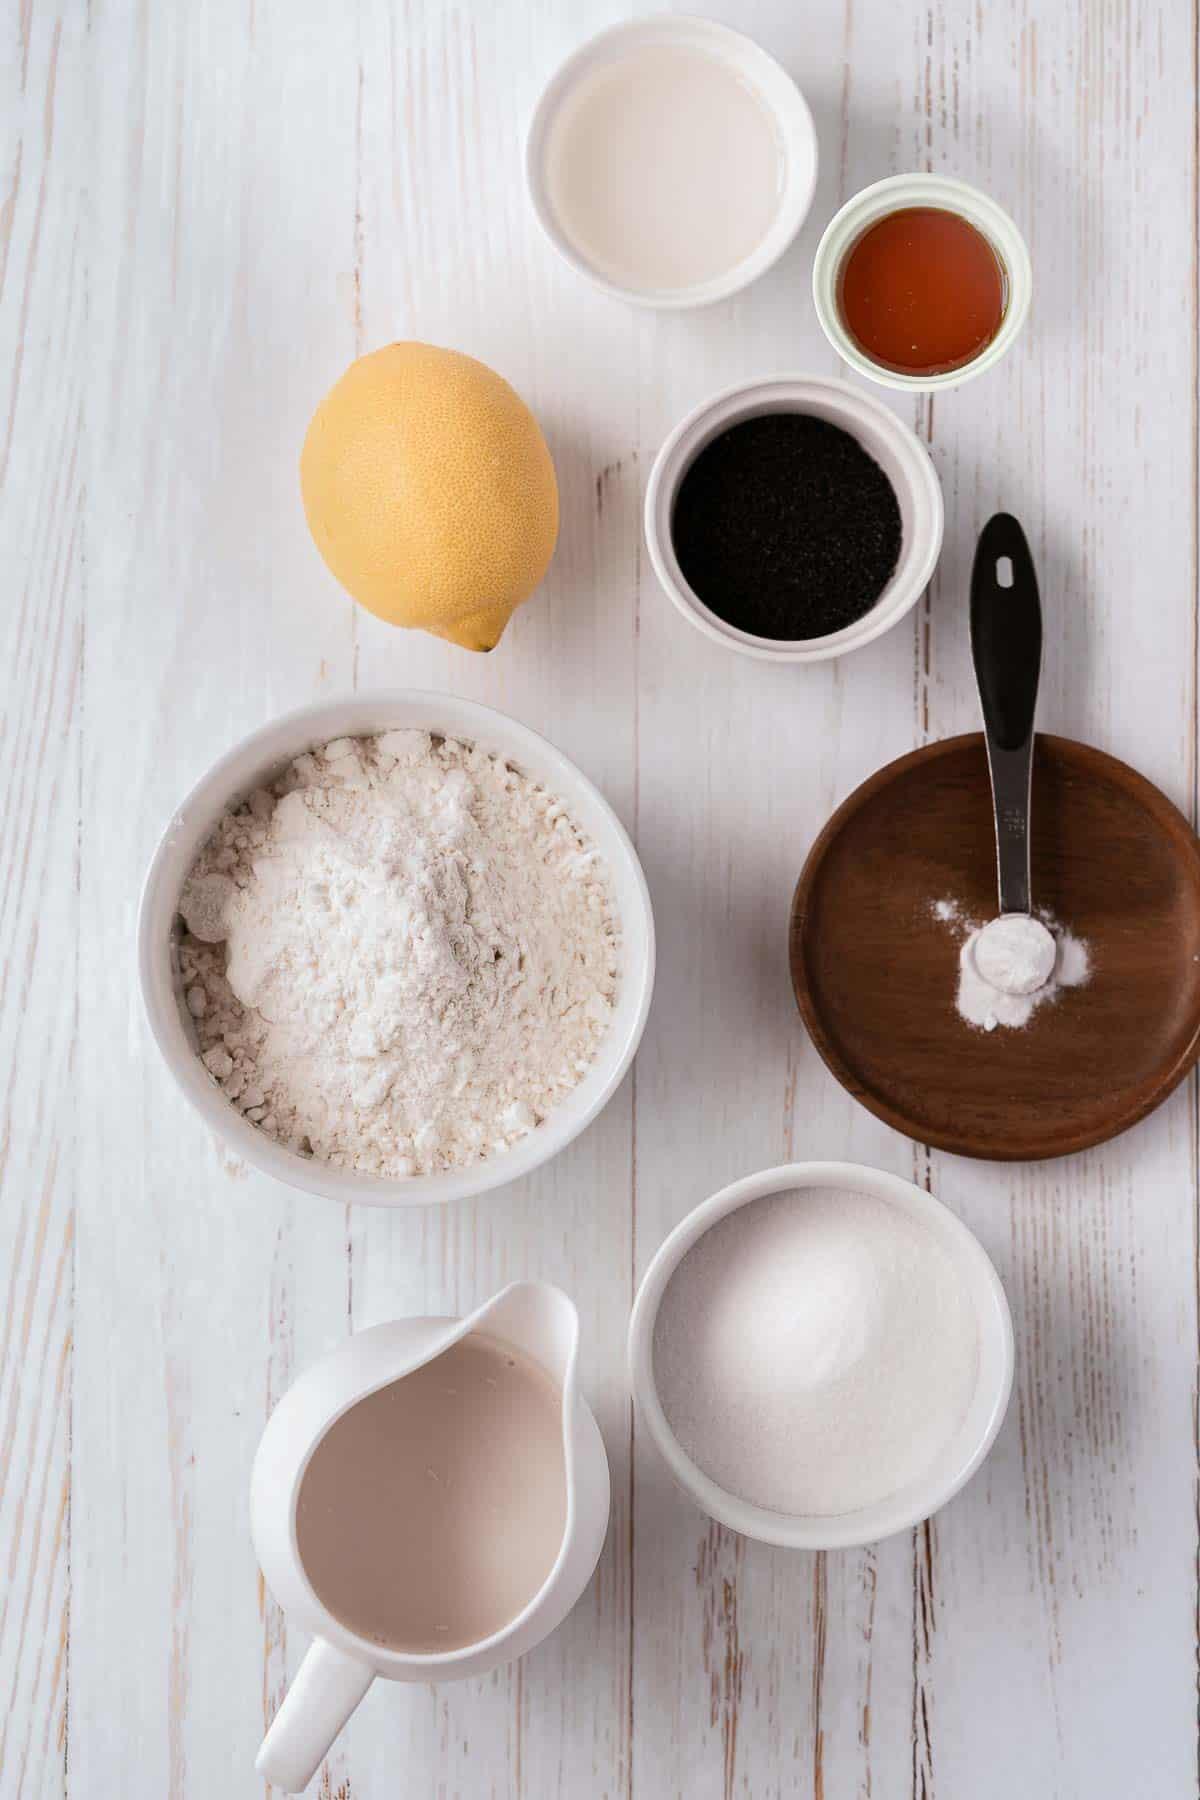 Ingredients to make vegan lemon poppy seed loaf.